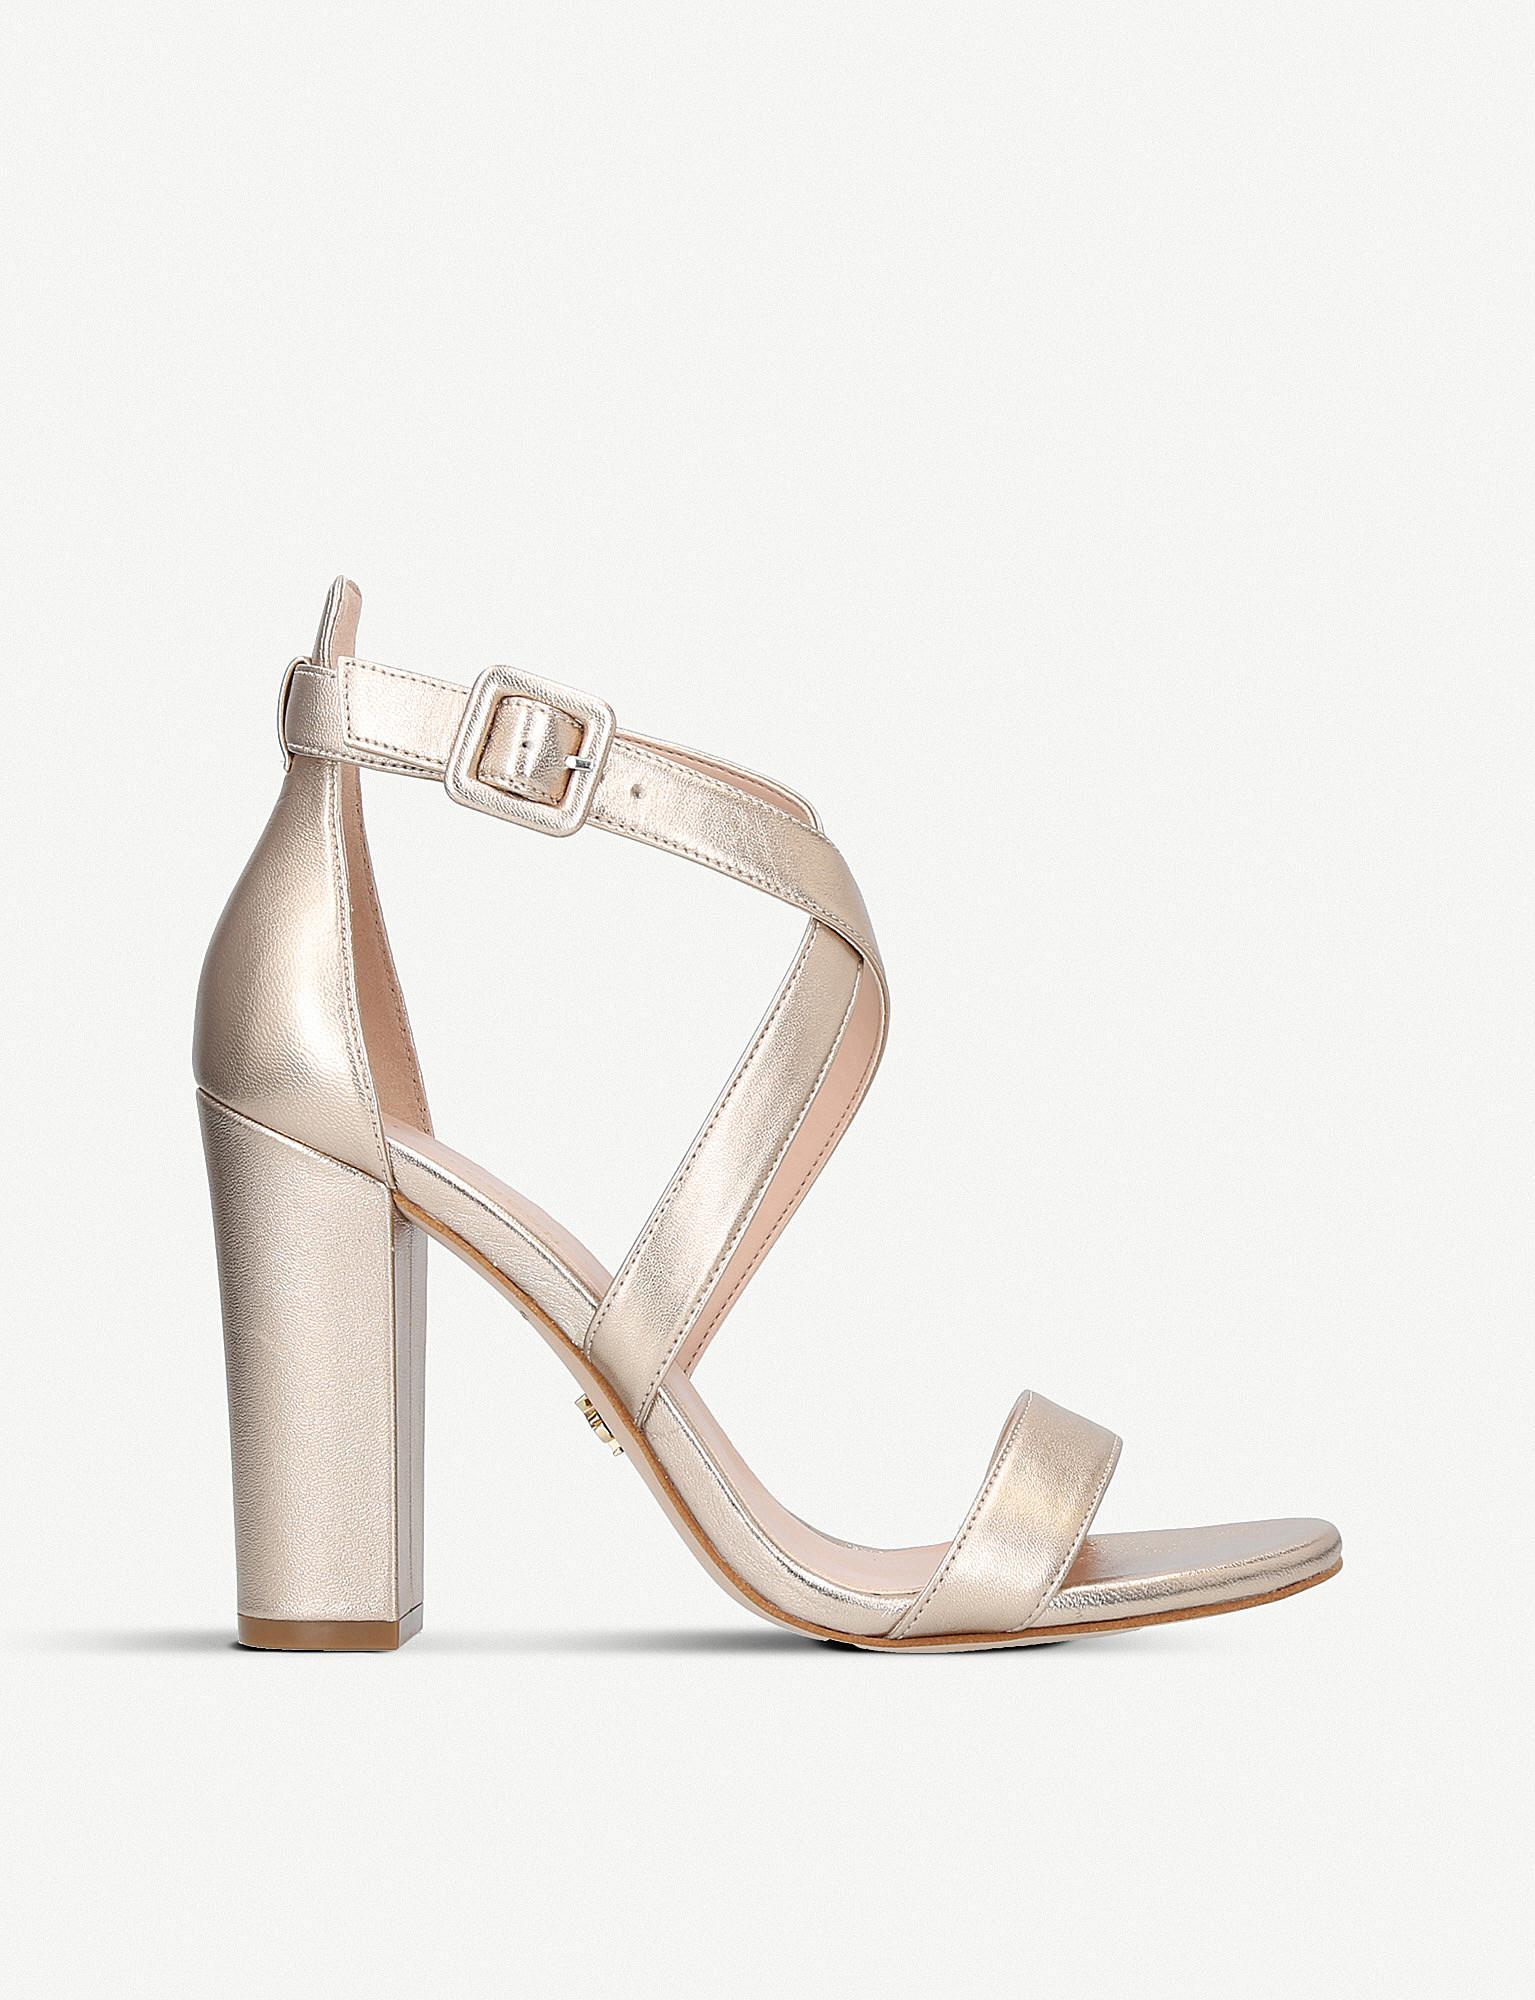 6ce513d93e37 Kurt Geiger Dover Metallic Leather Heeled Sandals in Metallic - Lyst